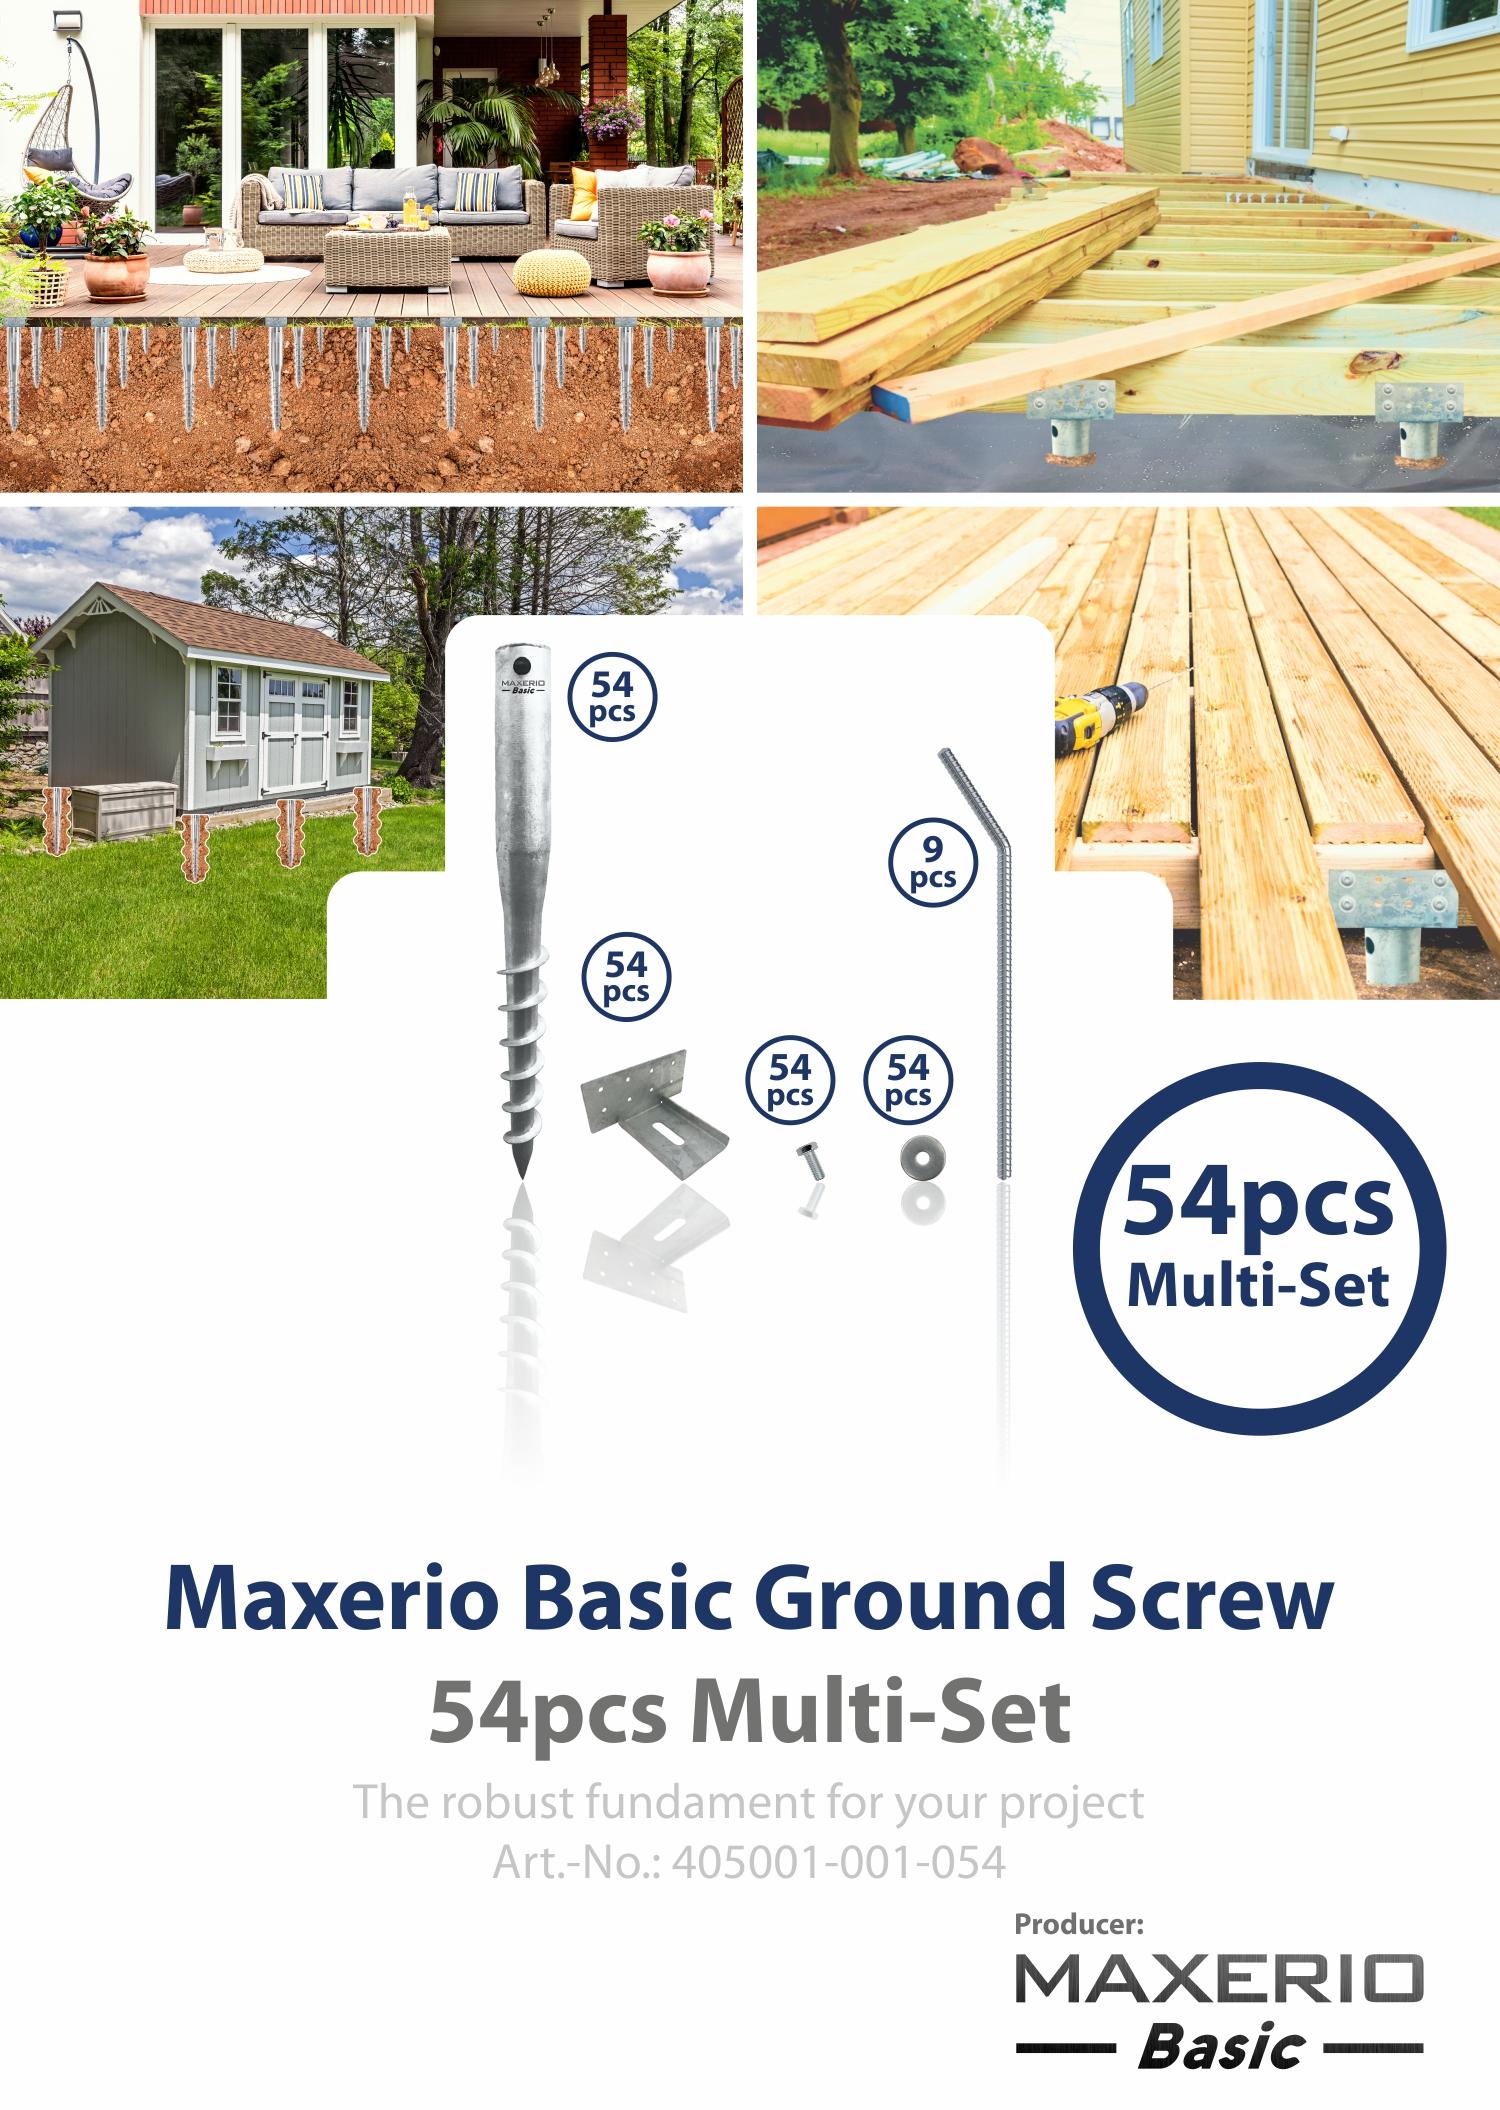 600mm M12 inkl Multi-Set Maxerio Schraubfundamente Ø 60 x 2; Länge Konsole